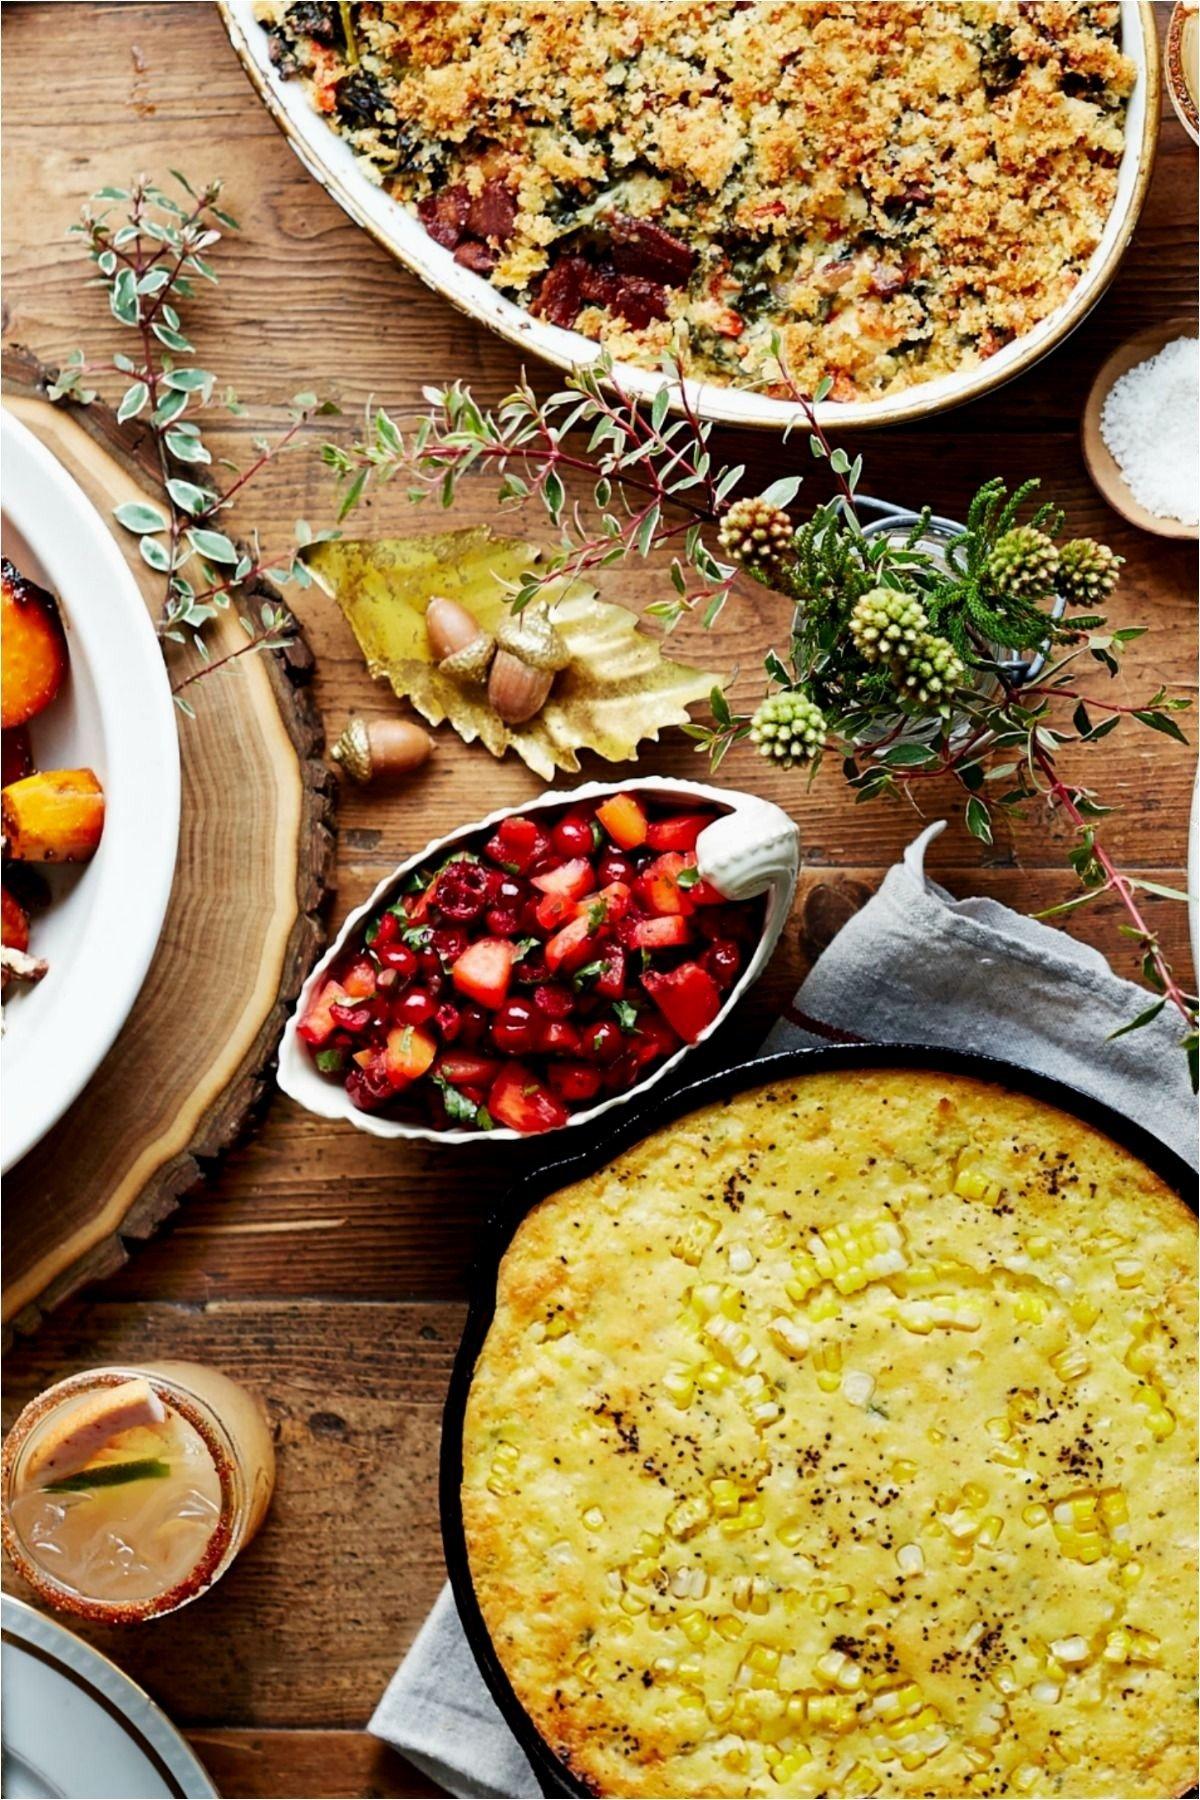 10 Lovable Christmas Dinner Ideas For Large Group christmas dinner ideas for large group canape 1 2021